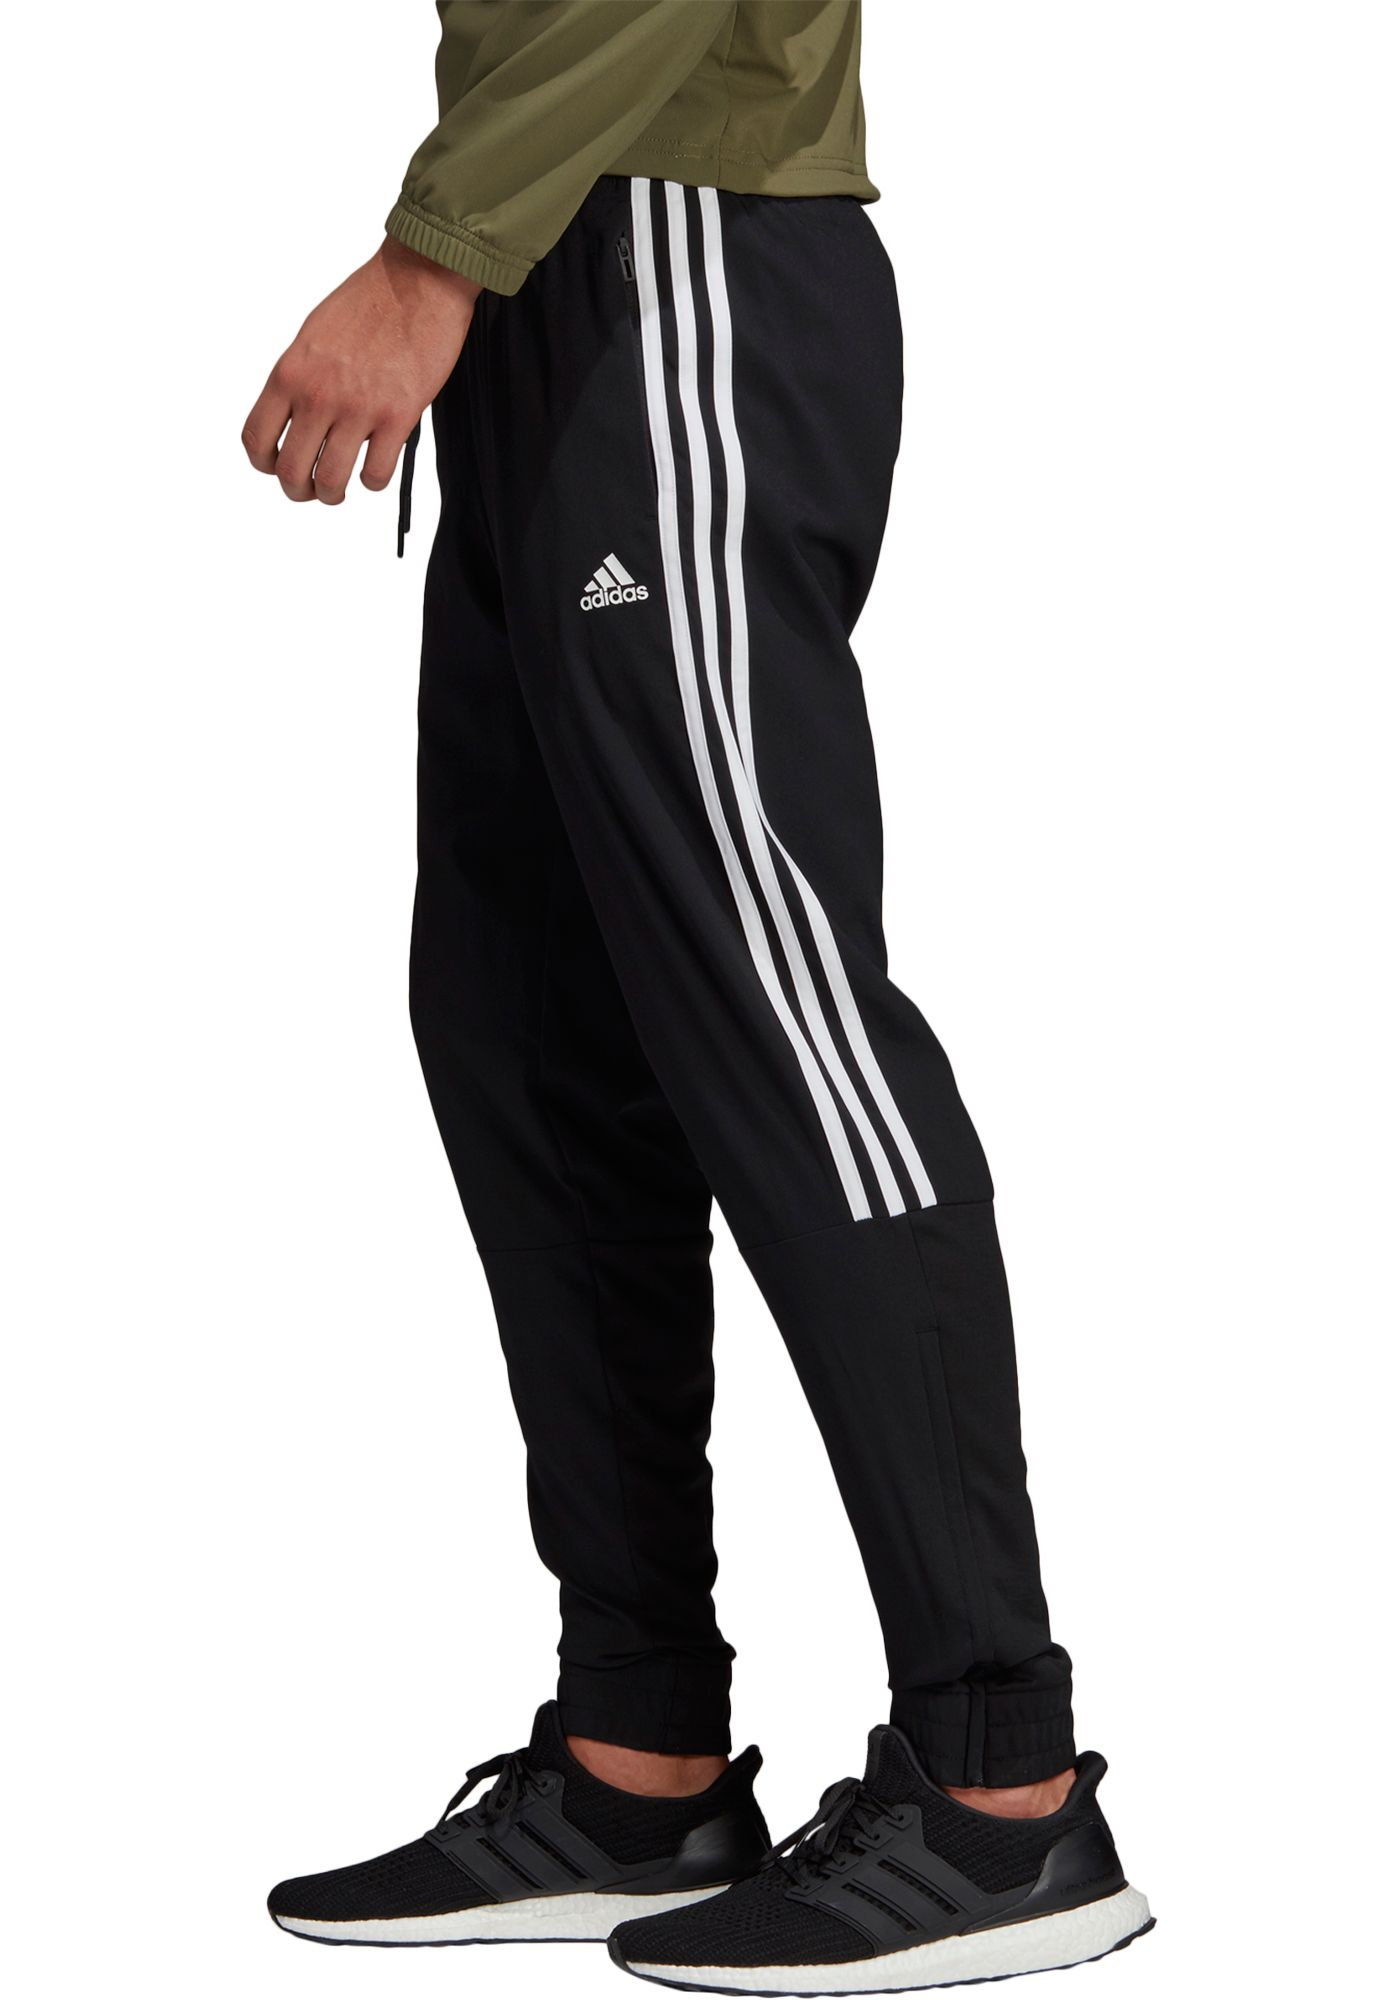 adidas Men's Sport ID Tiro Woven Pants